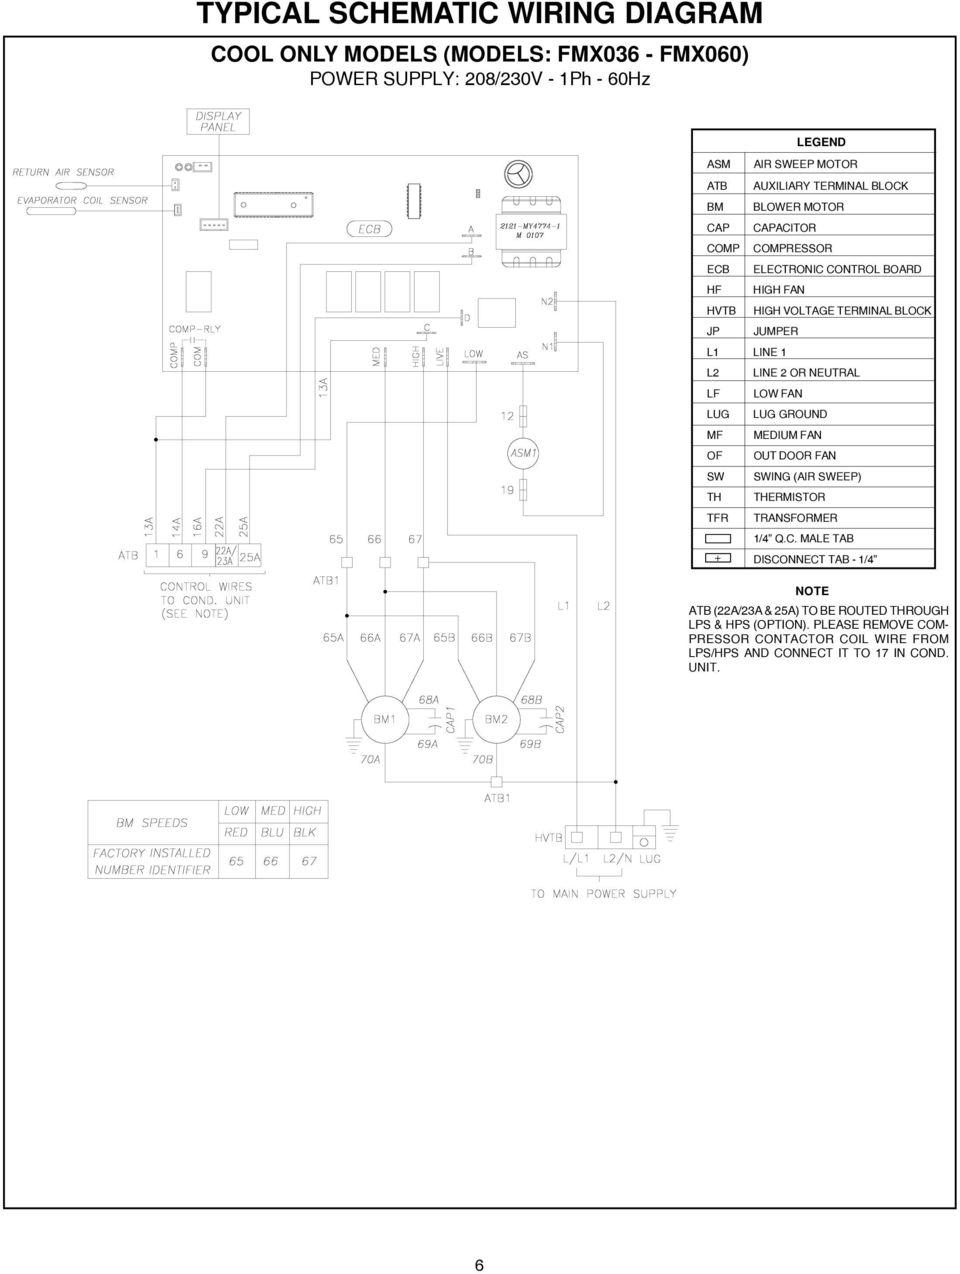 Exelent trane pressor wiring diagram gift electrical and wiring hvac wiring diagrams ml wiring diagram westinghouse